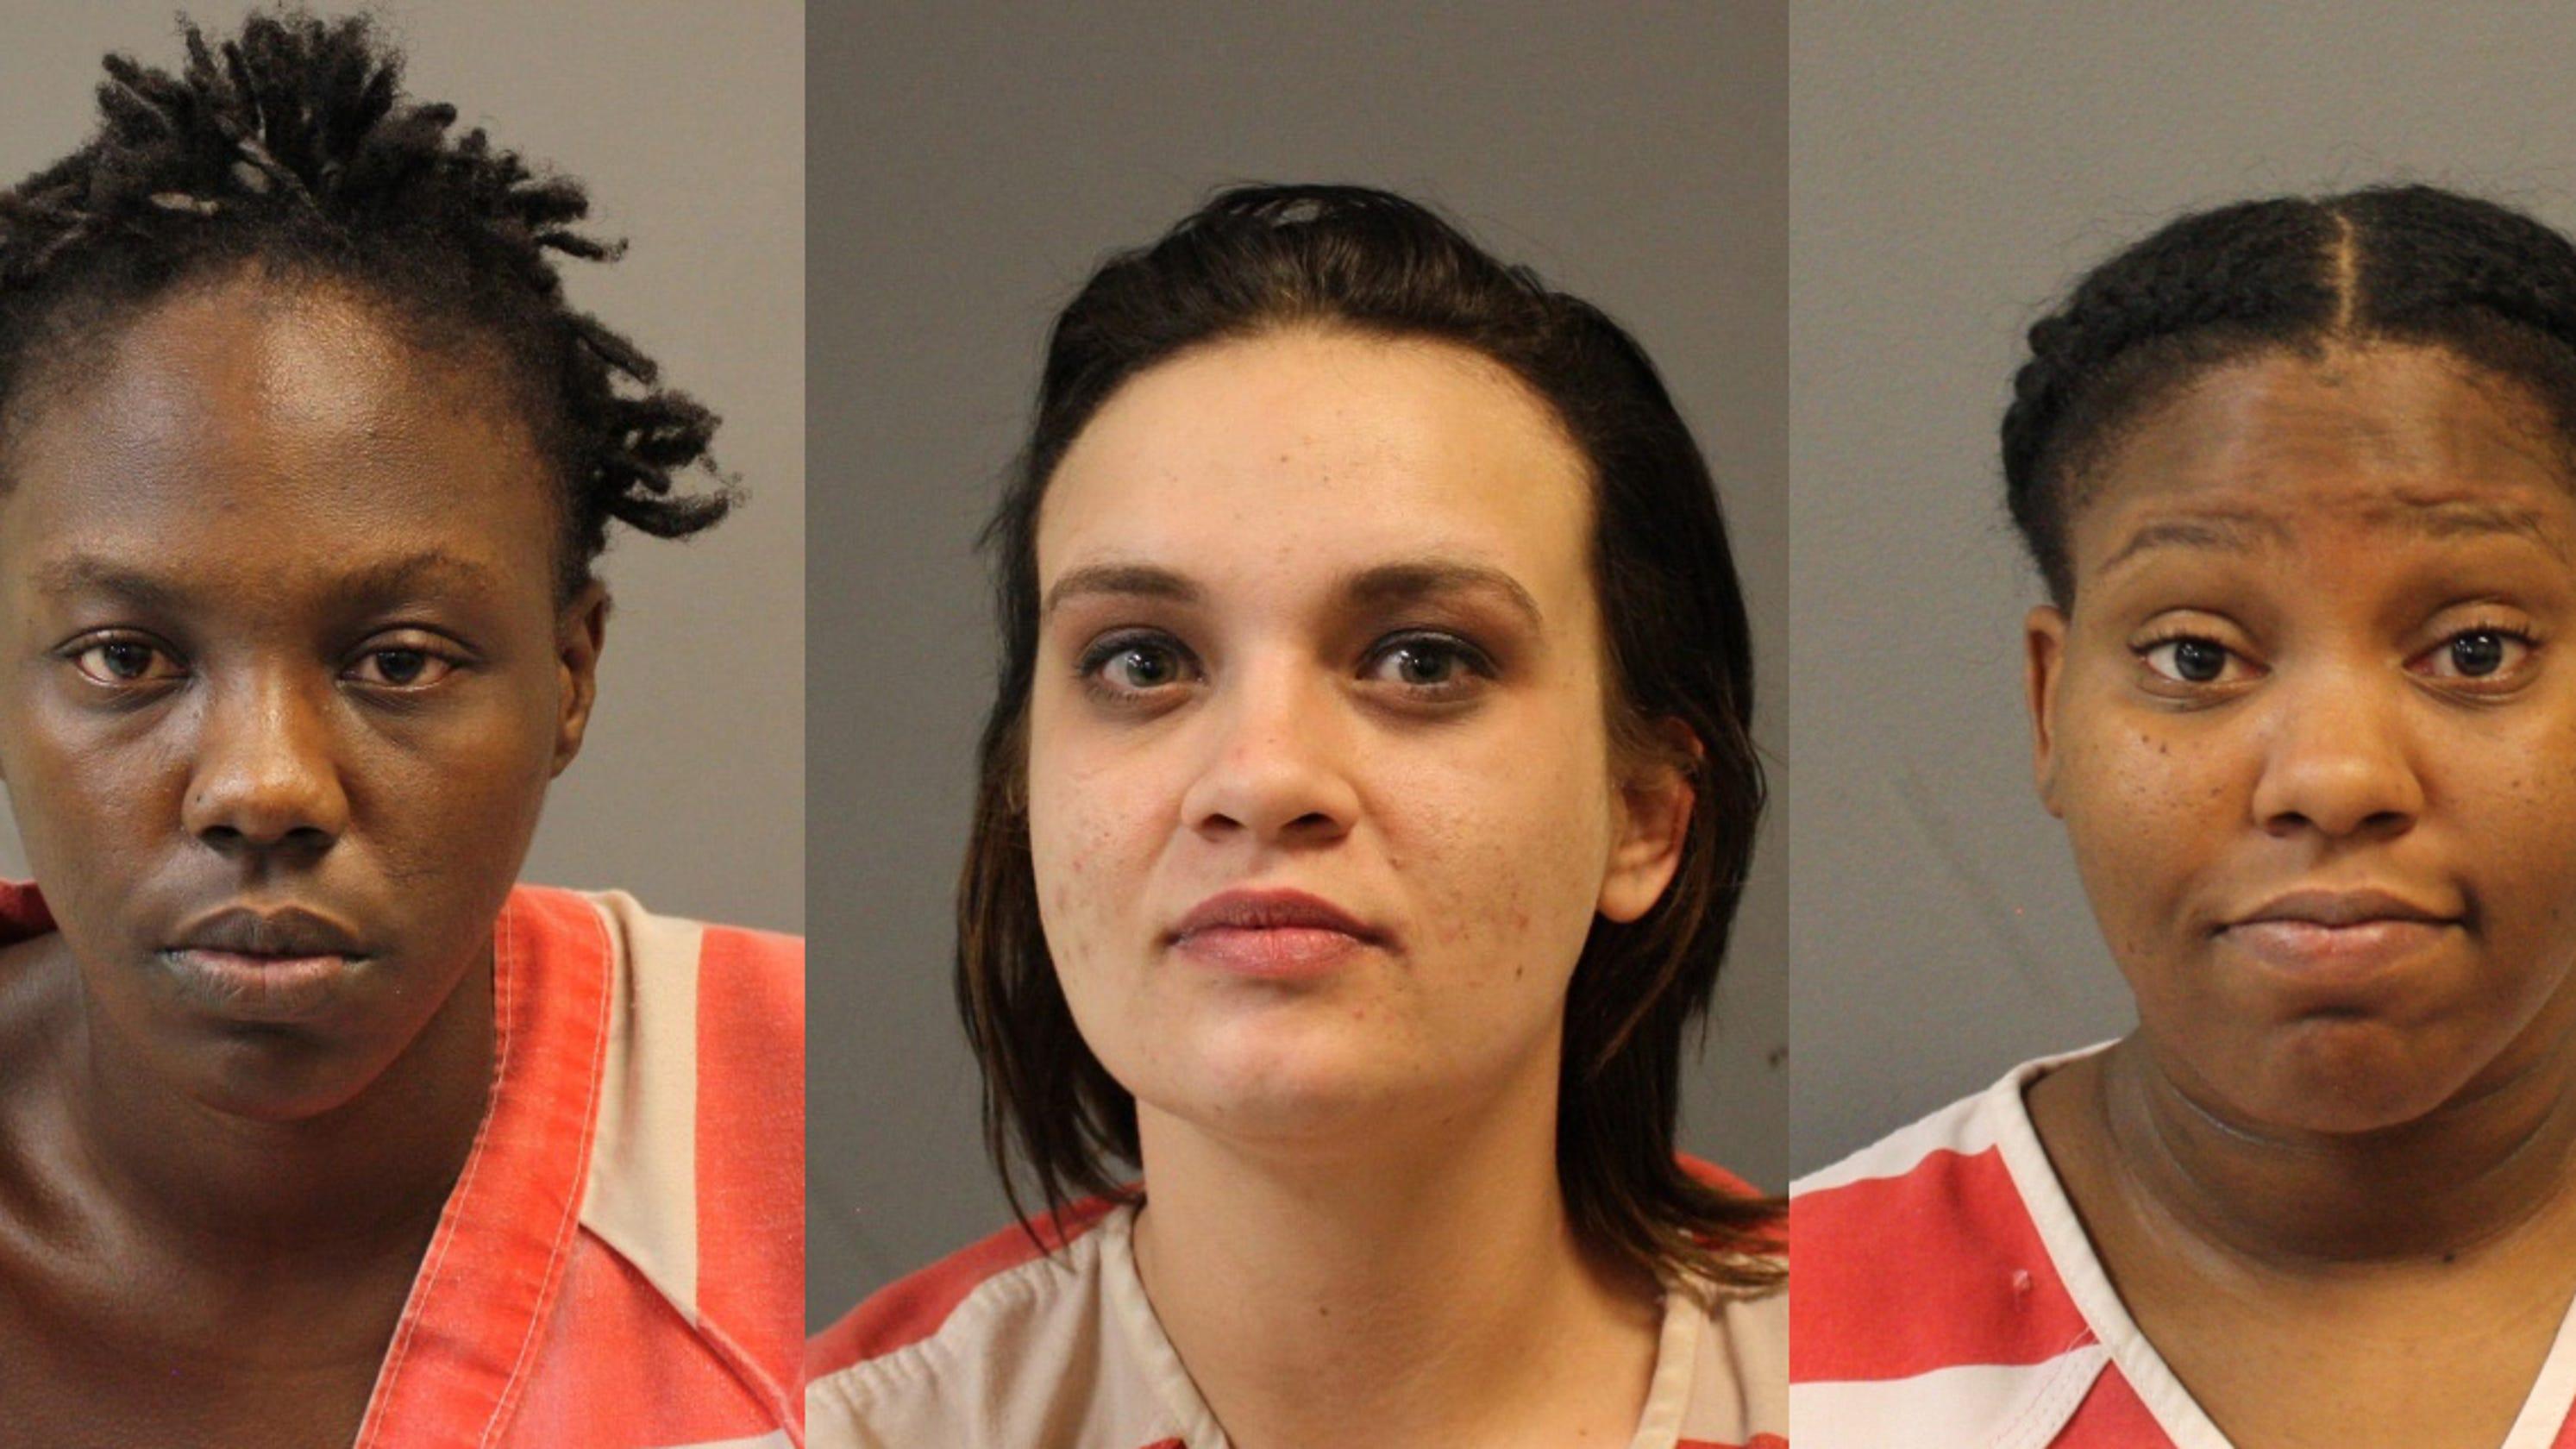 Phoenix woman arrested in prostitution sting - Arizonas